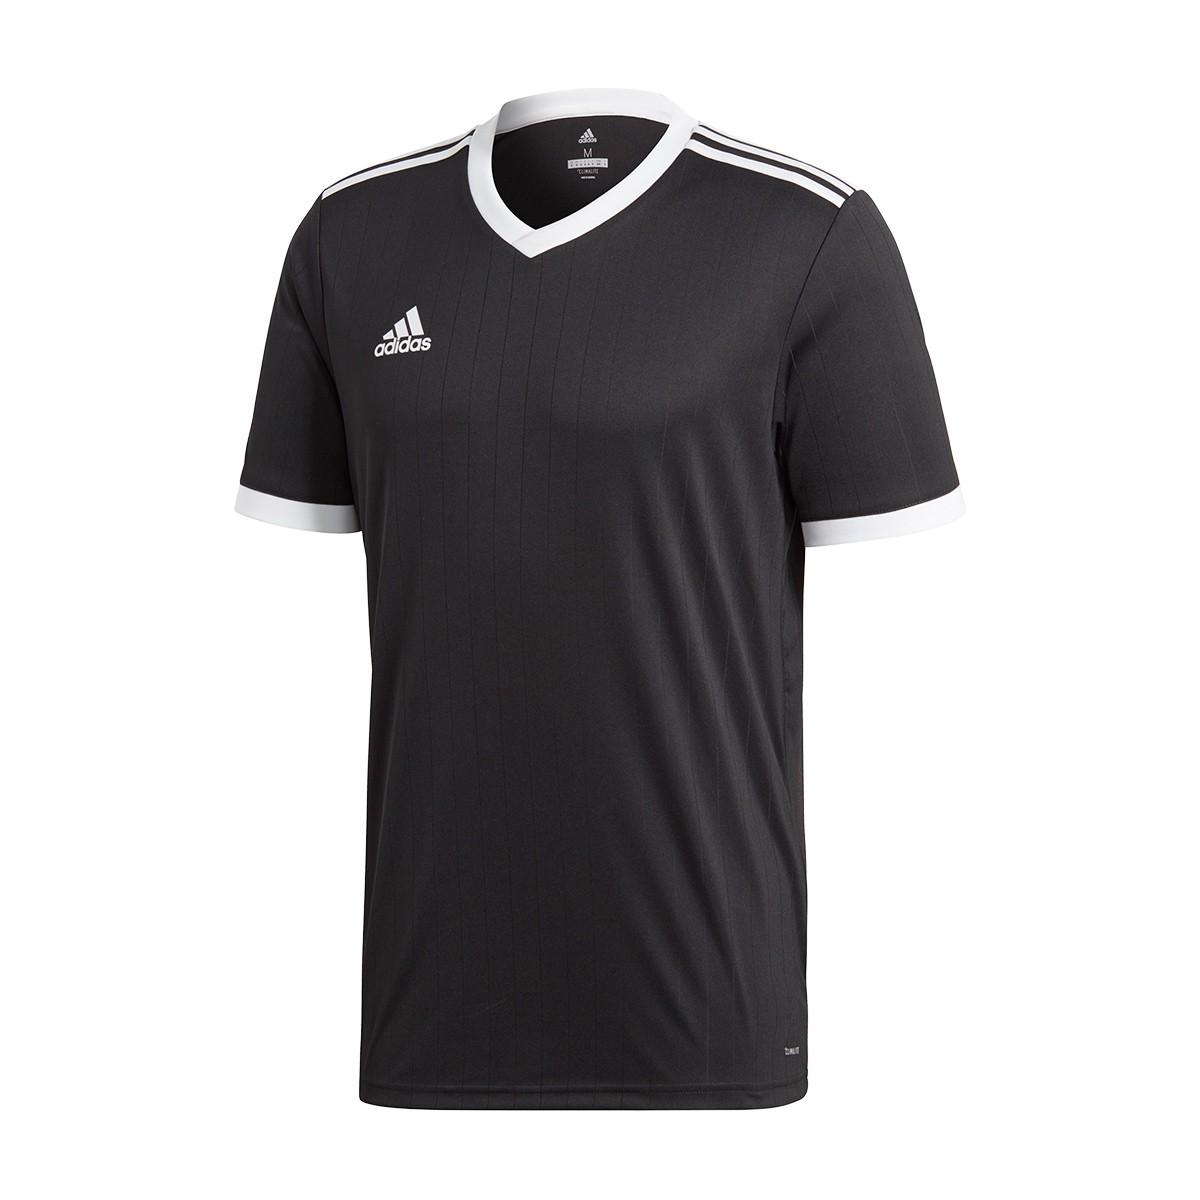 8e3730312 Jersey adidas Tabela 18 m/c Black-White - Tienda de fútbol Fútbol Emotion